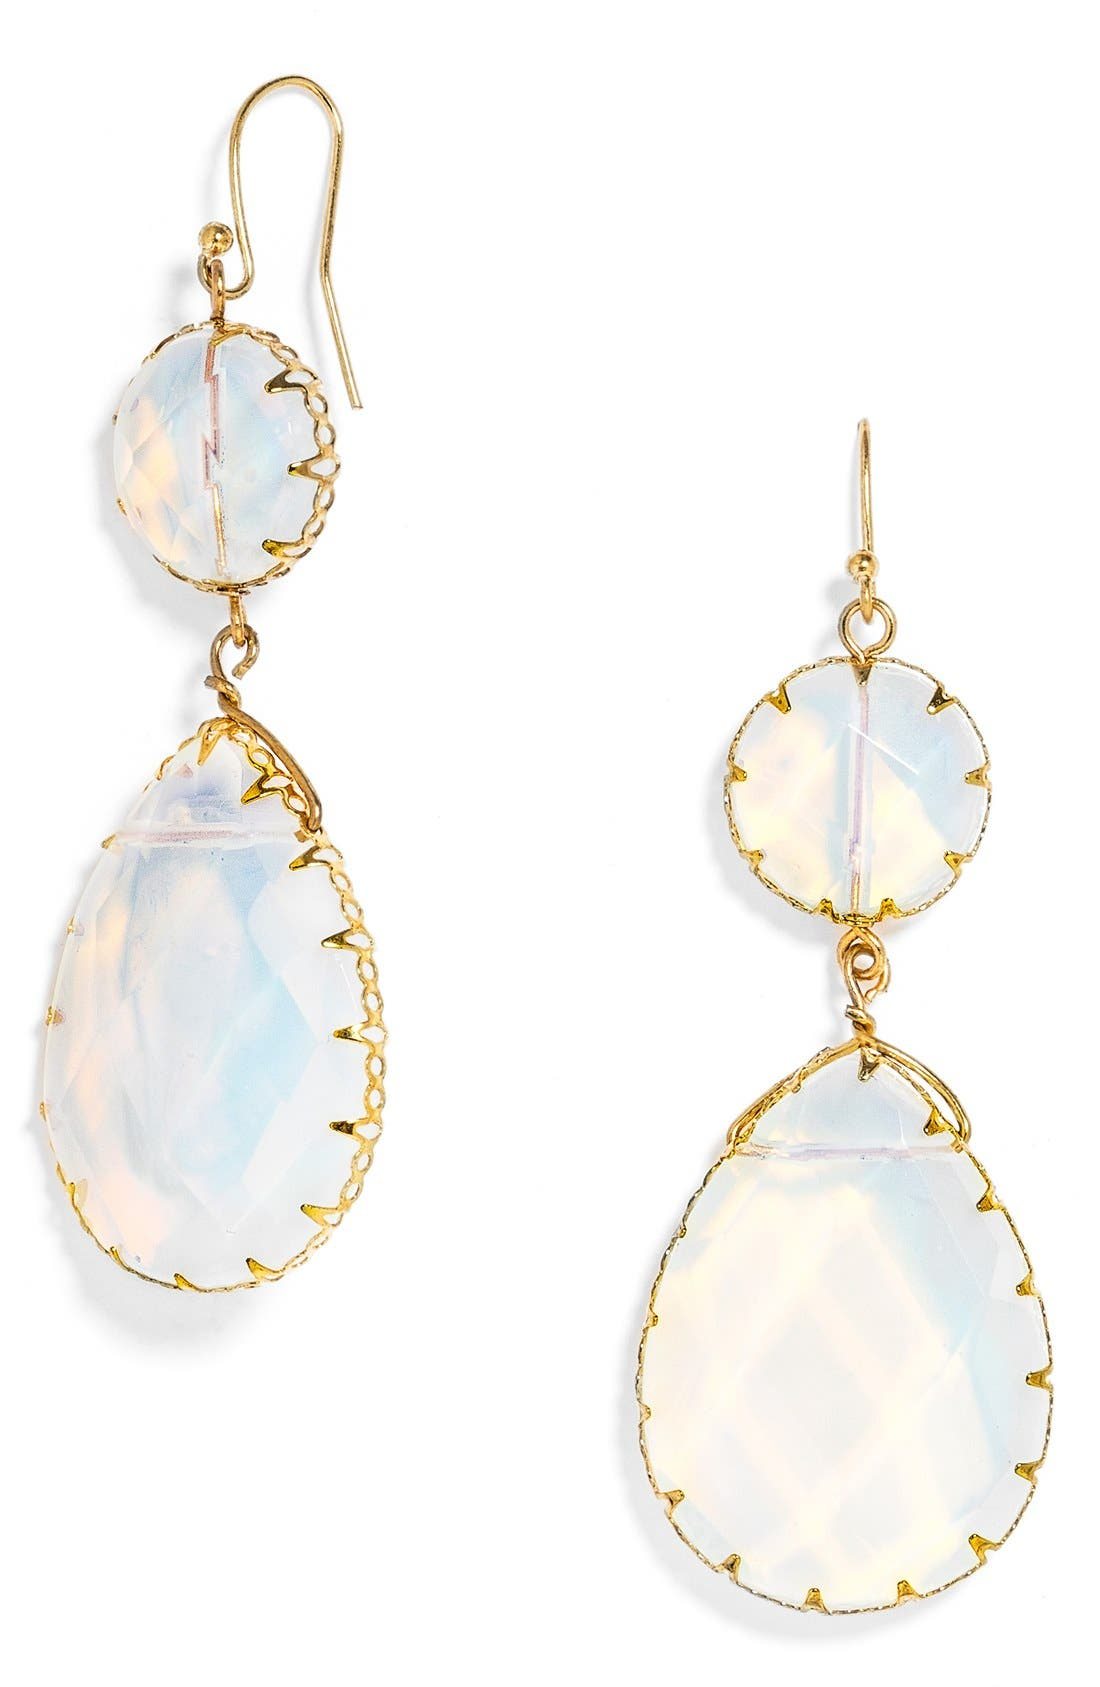 BAUBLEBAR 'Luxe Boho' Drop Earrings, Main, color, 100